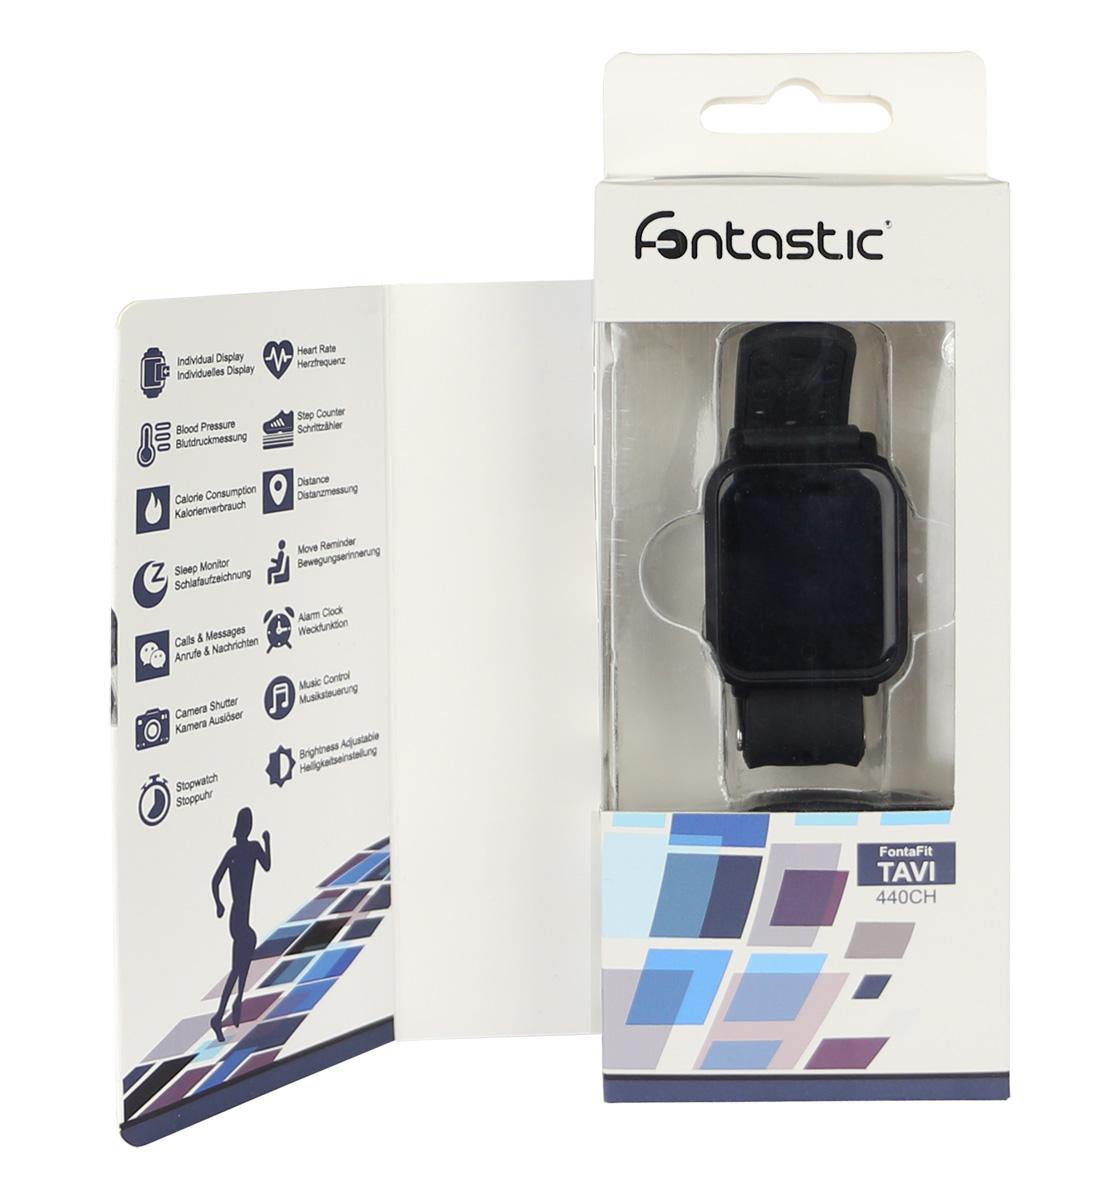 Bracciale Fitness Tracker Bluetooth 4.1 con Cardiofrequenzimetro